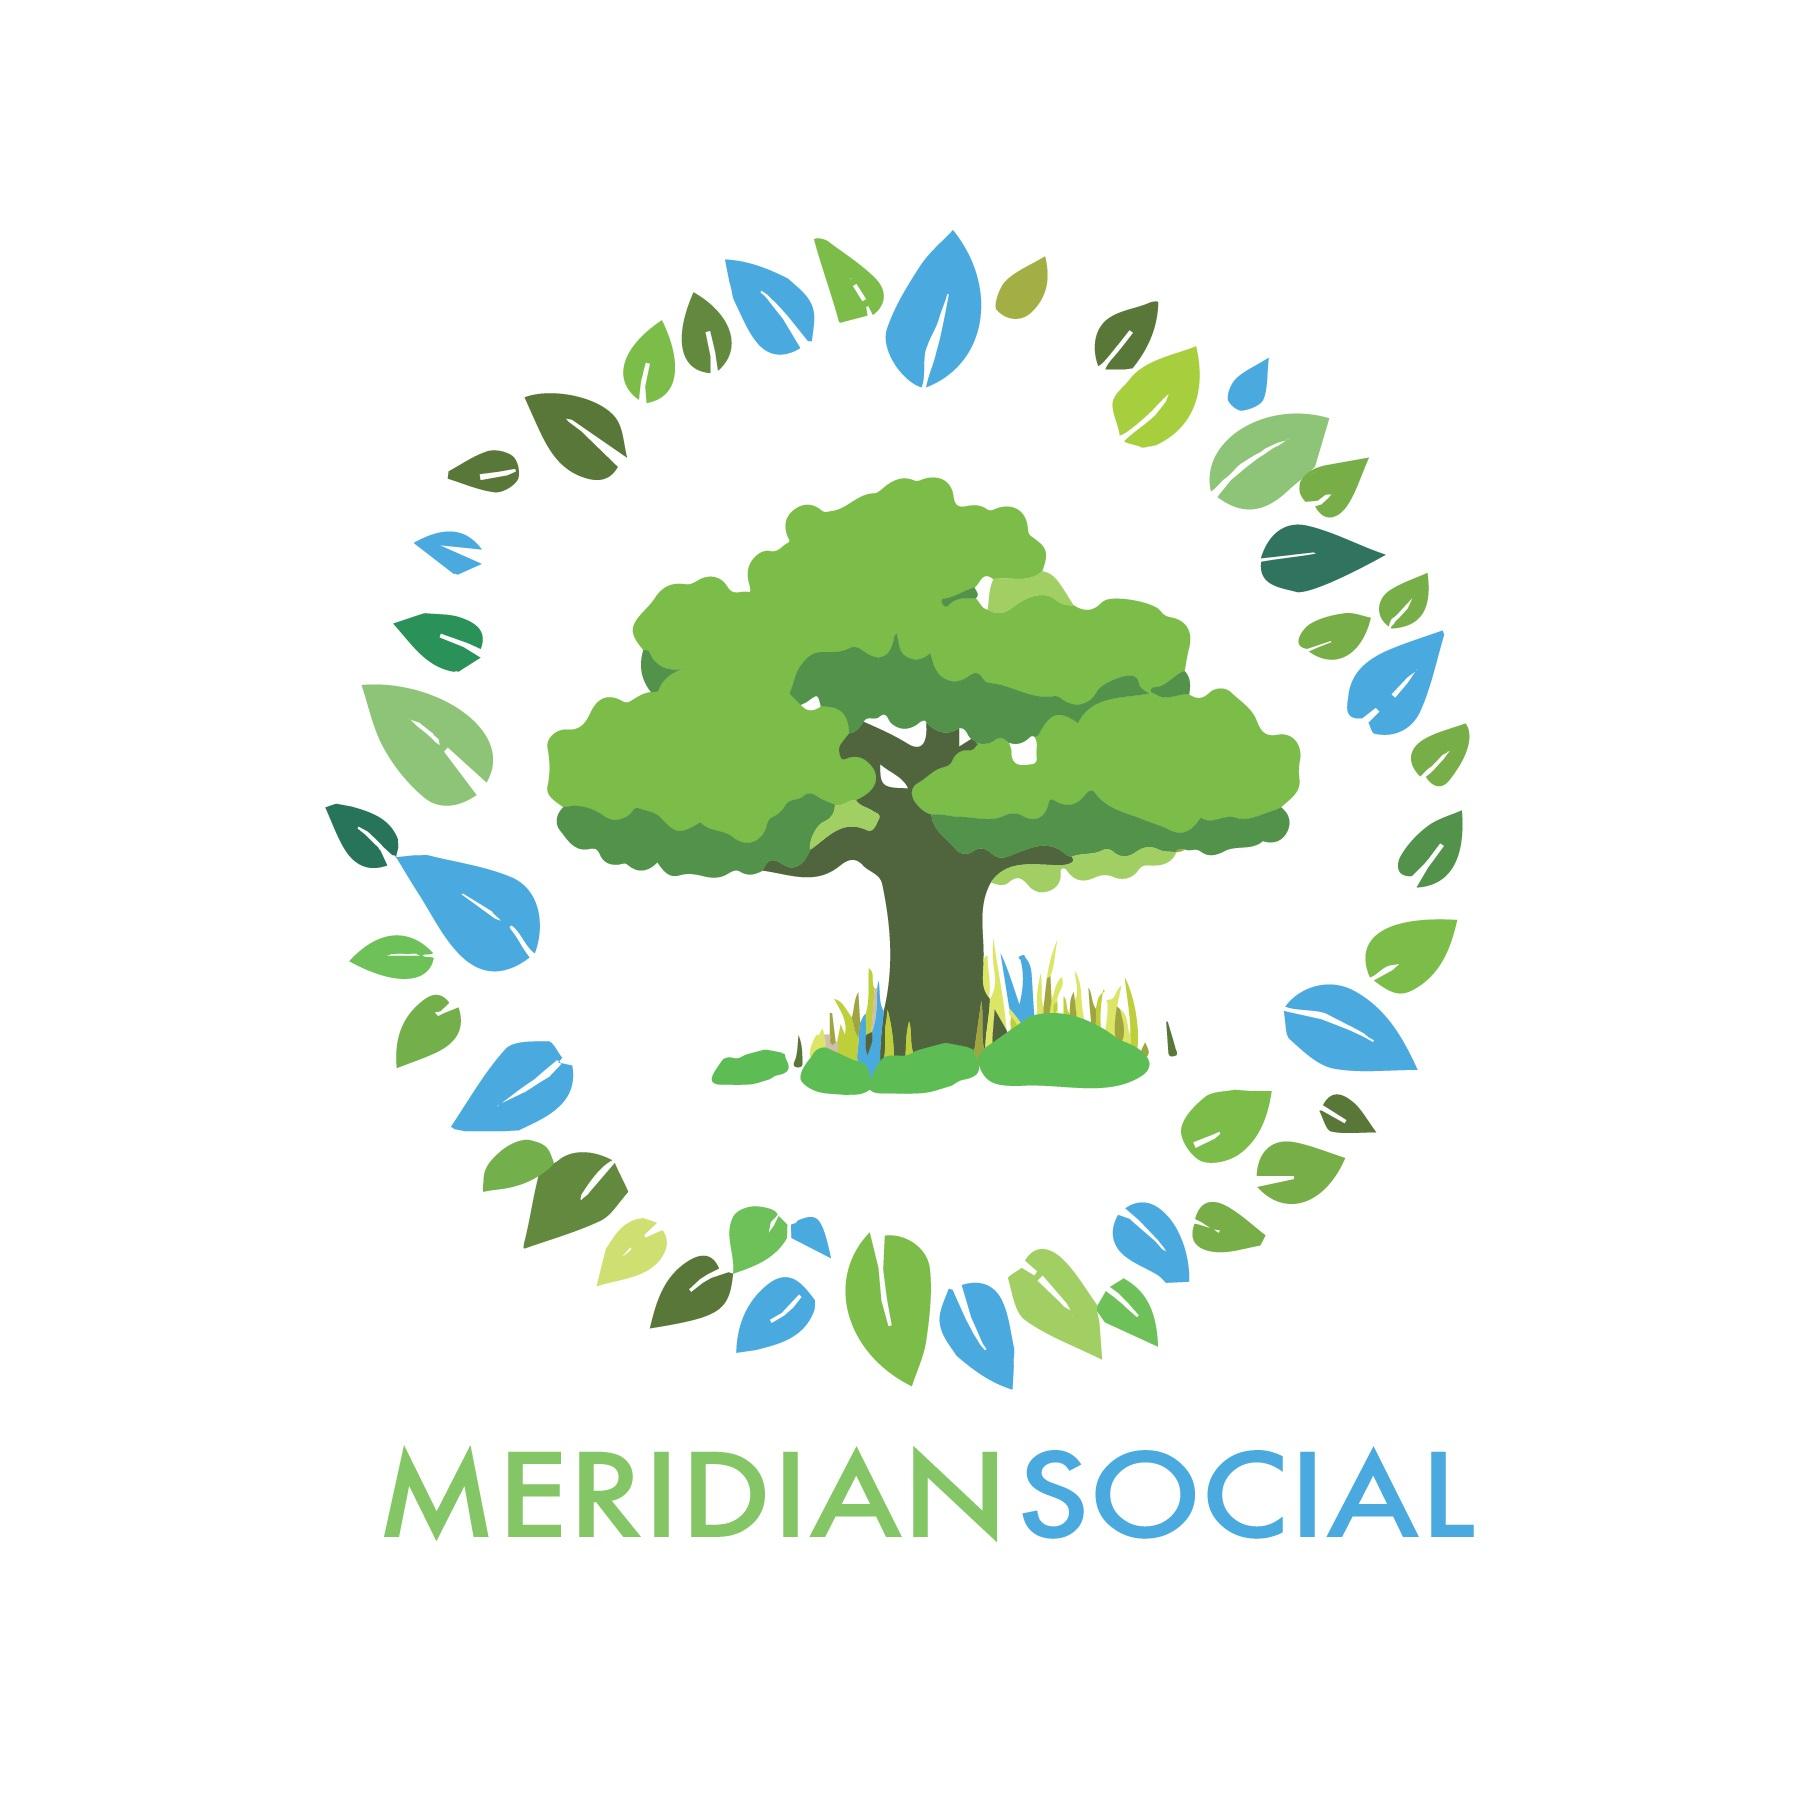 Meridian Social